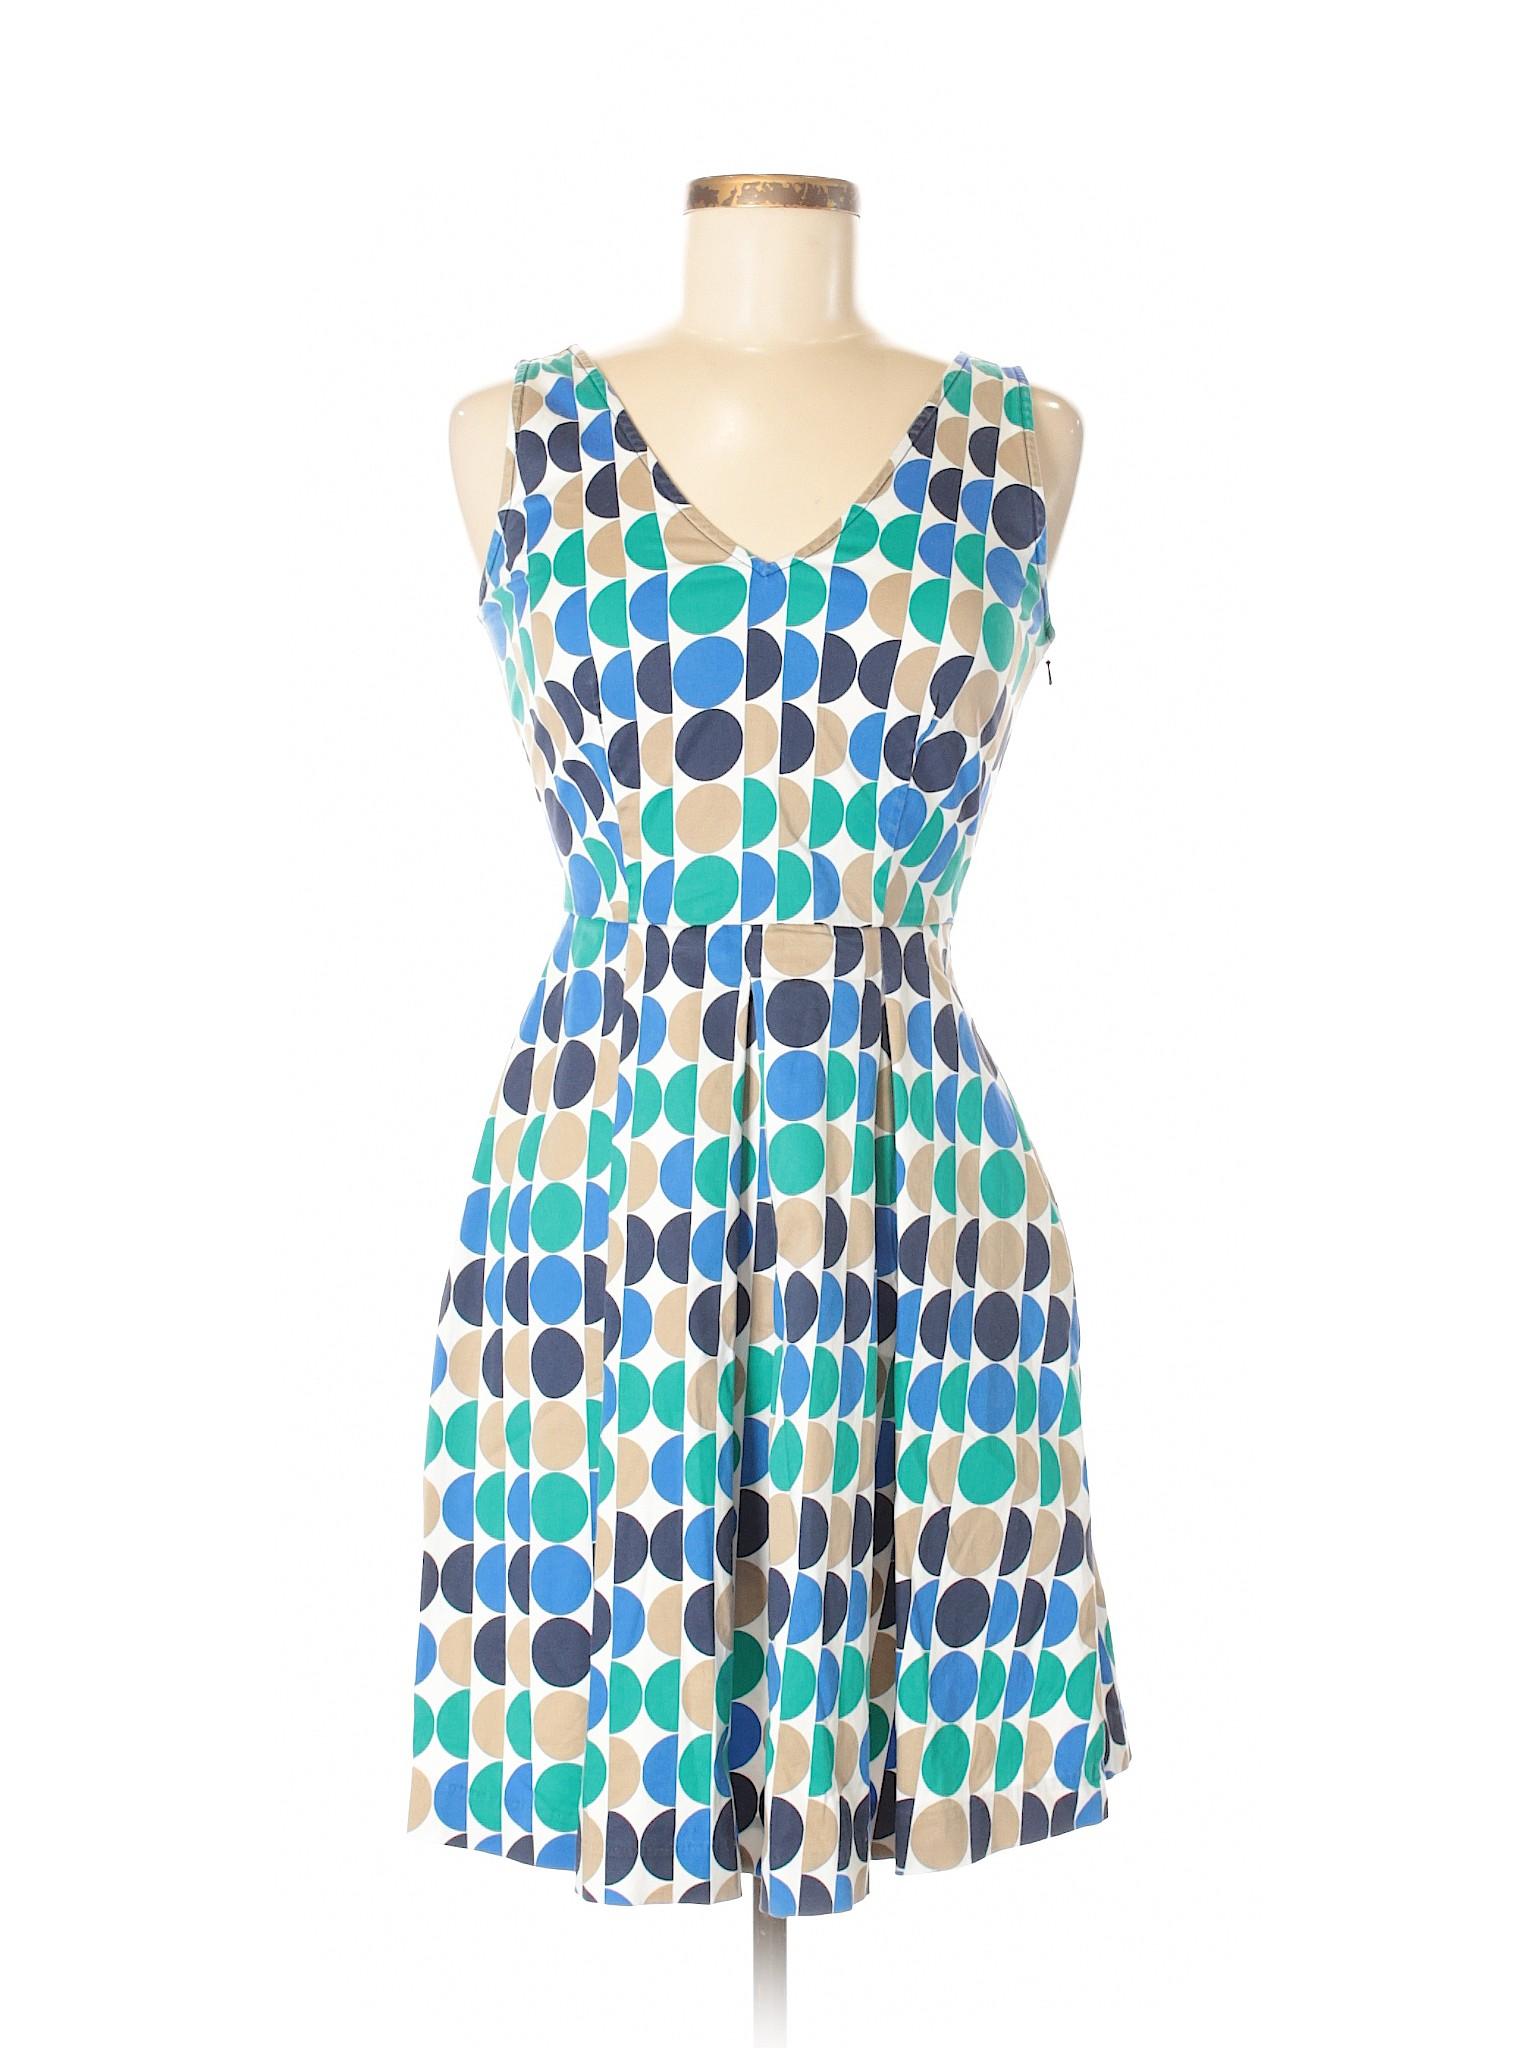 Casual Banana Factory Boutique Dress Republic winter Store nq5wPCXx